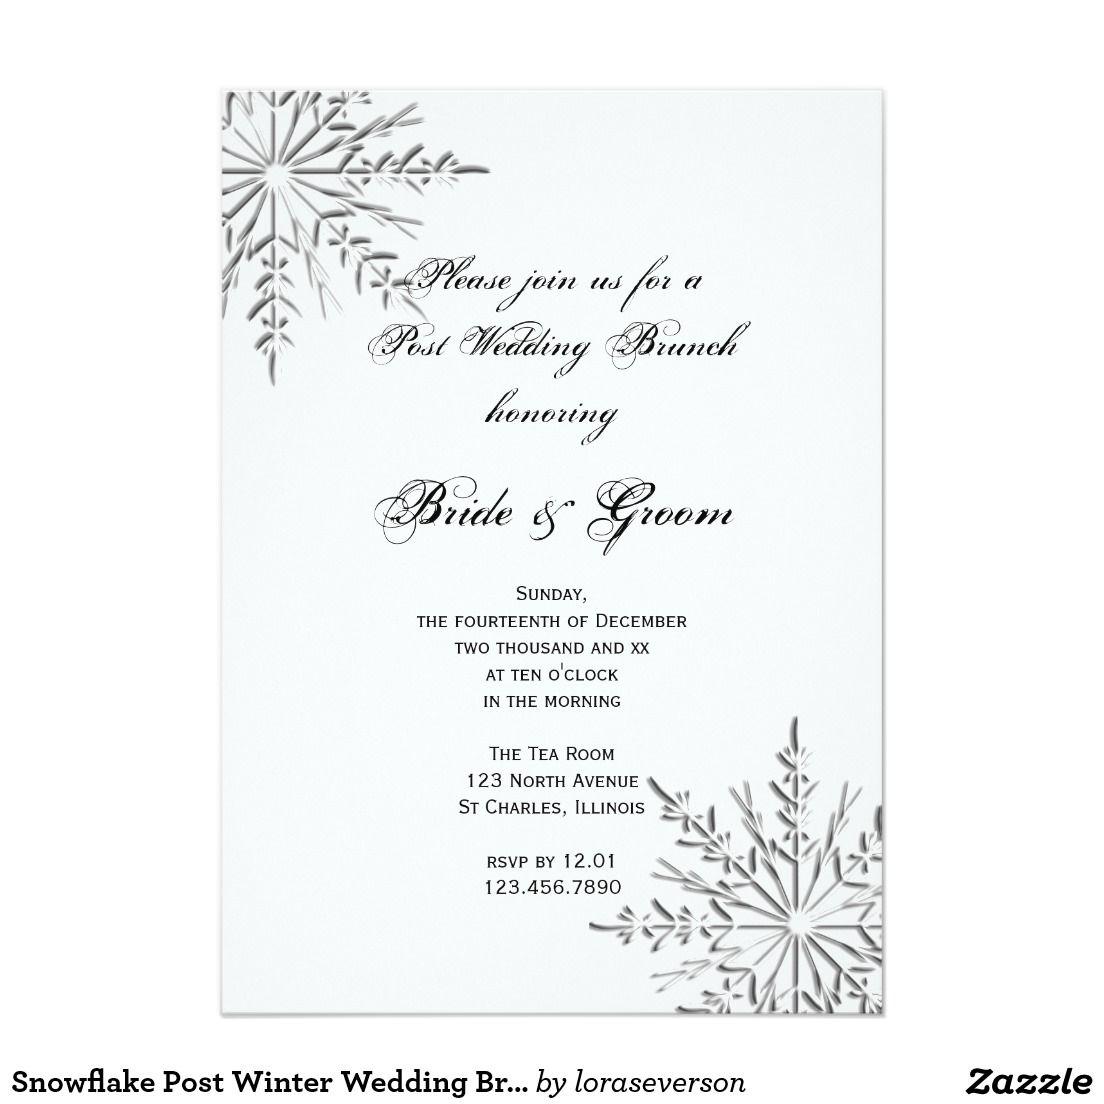 Snowflake Post Winter Wedding Brunch Invitation | Silver Wedding ...